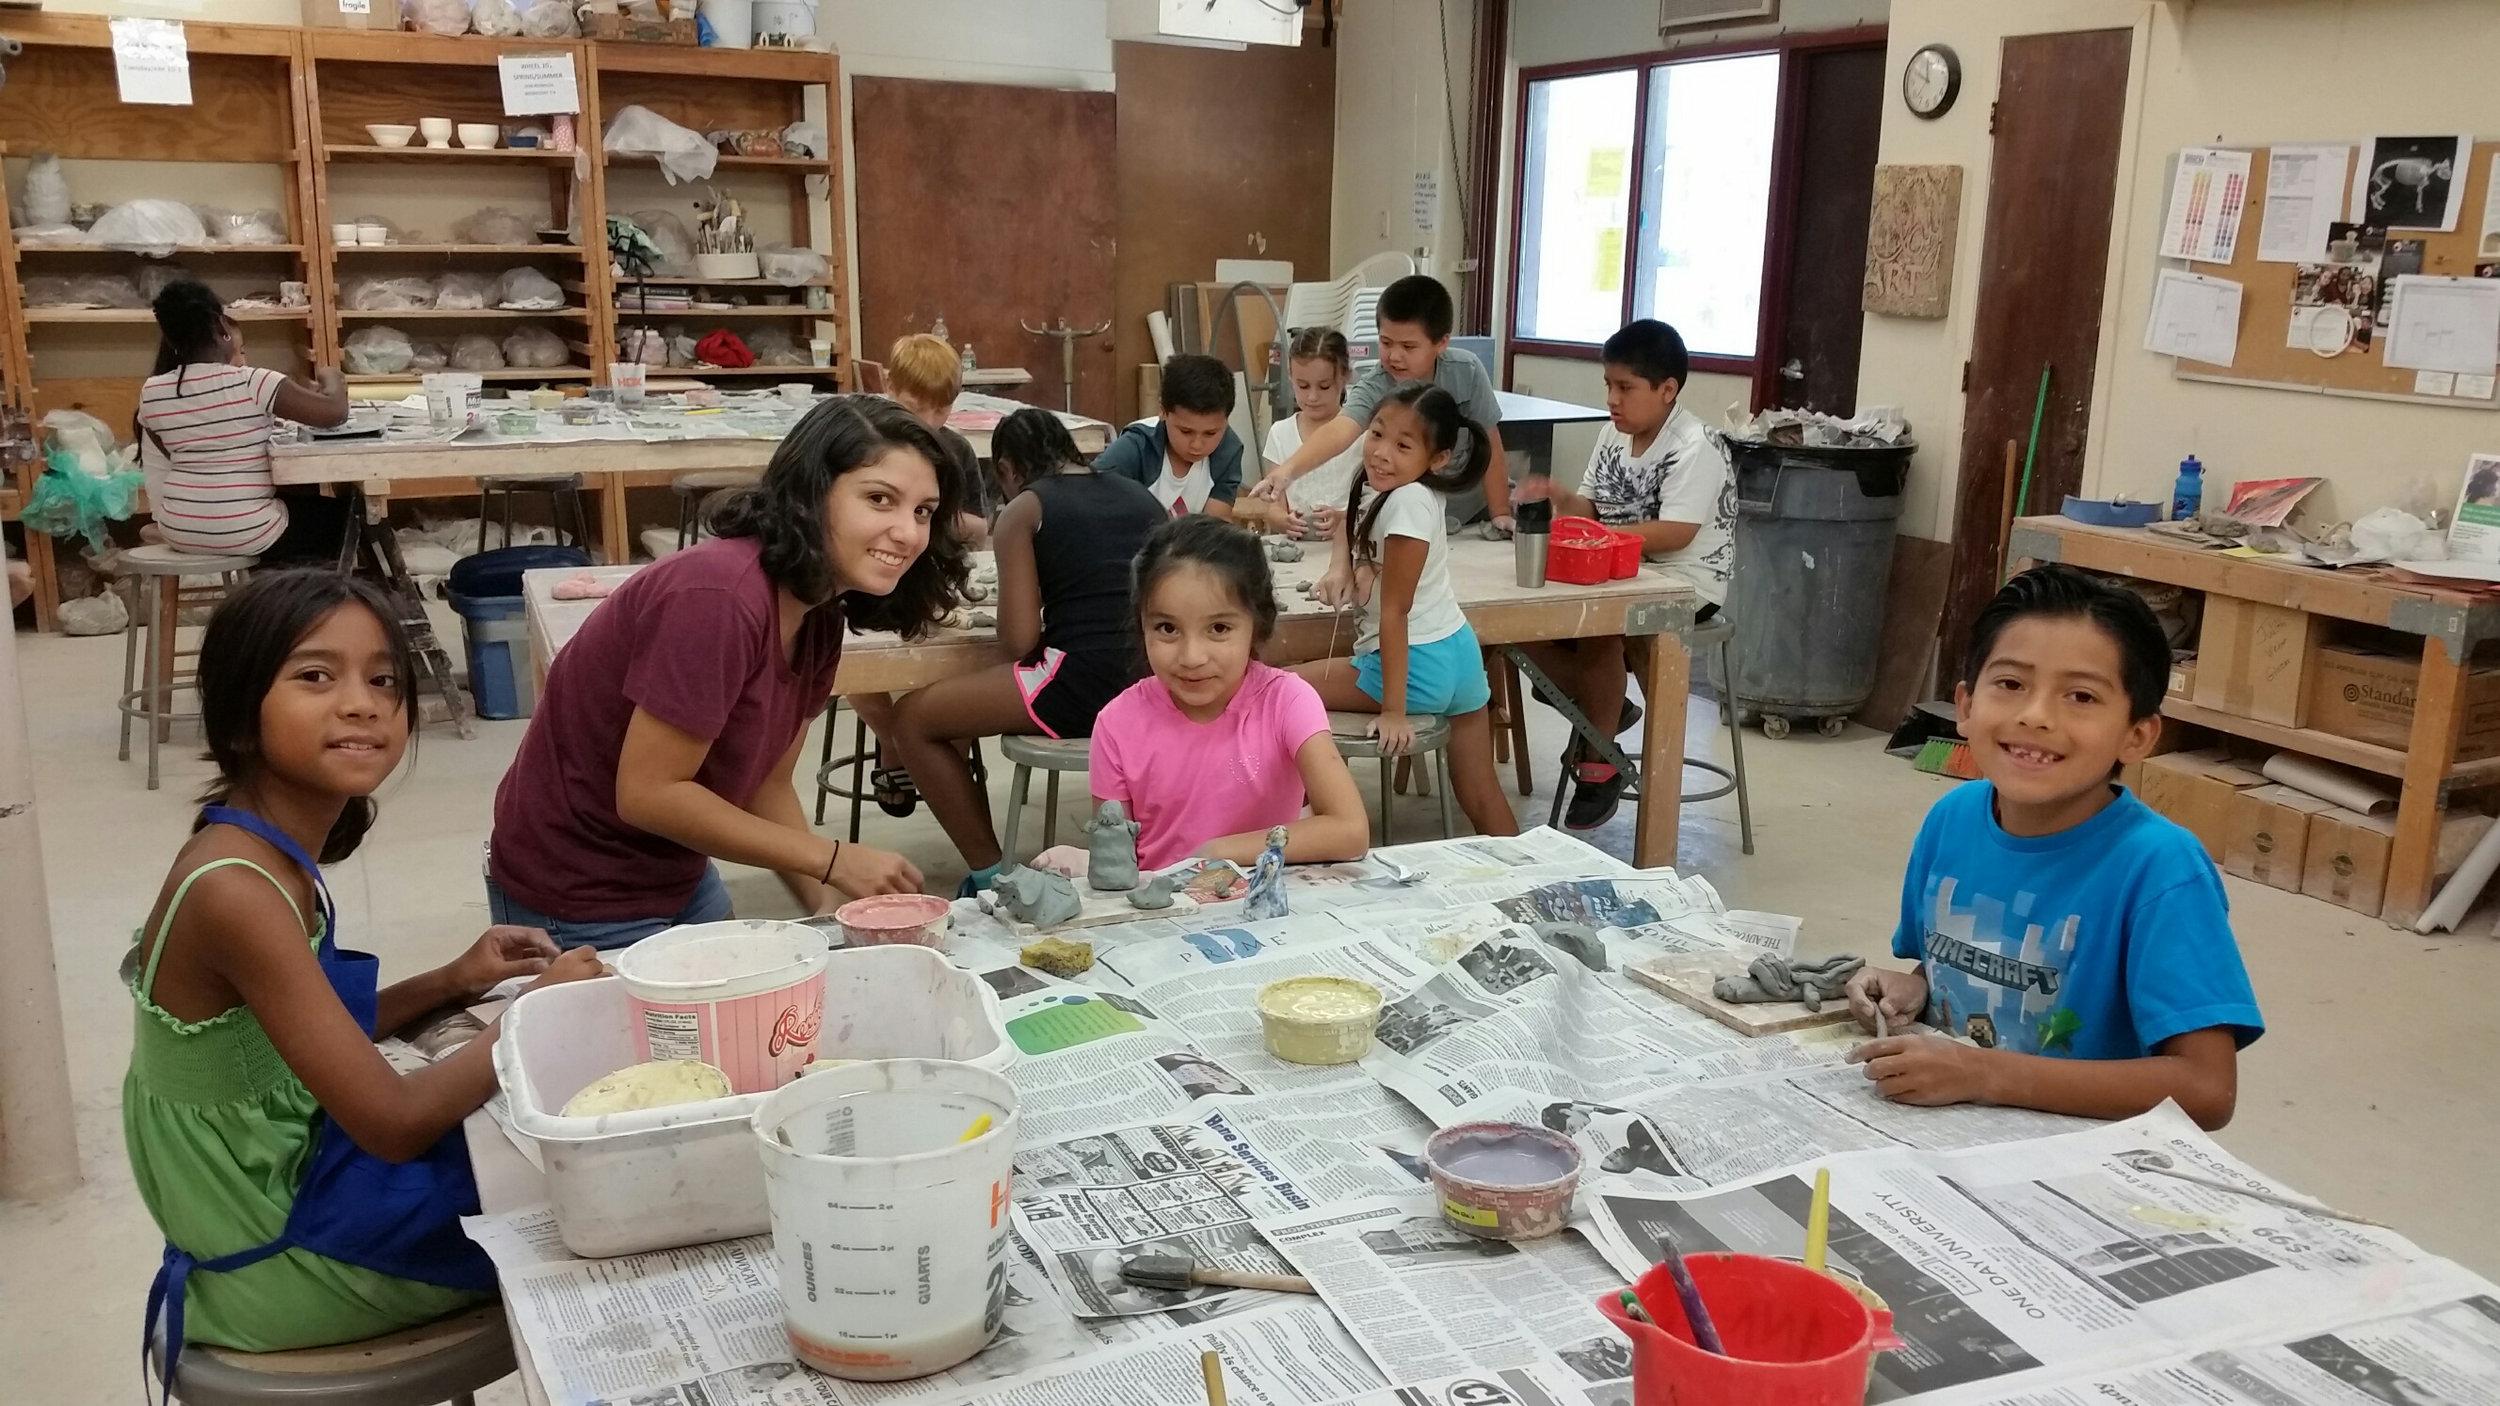 clay-art-center-kids-bring-change_28273915336_o1.jpg